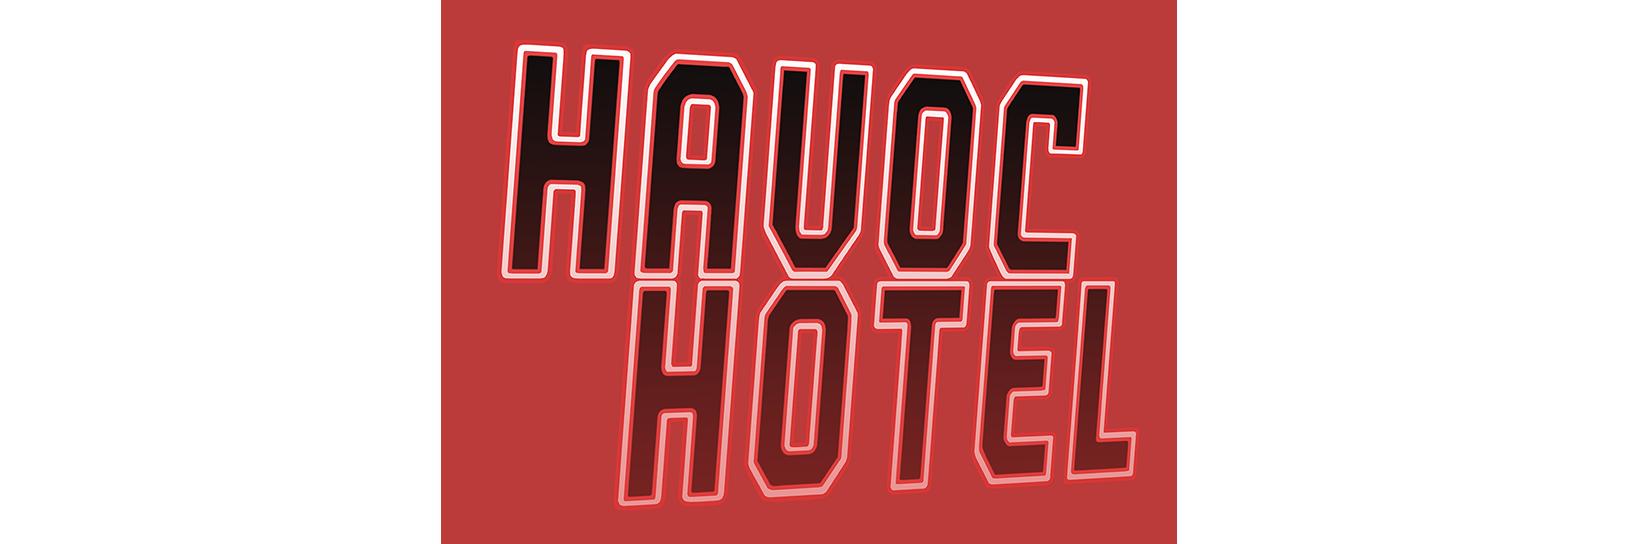 Havoc Hotel